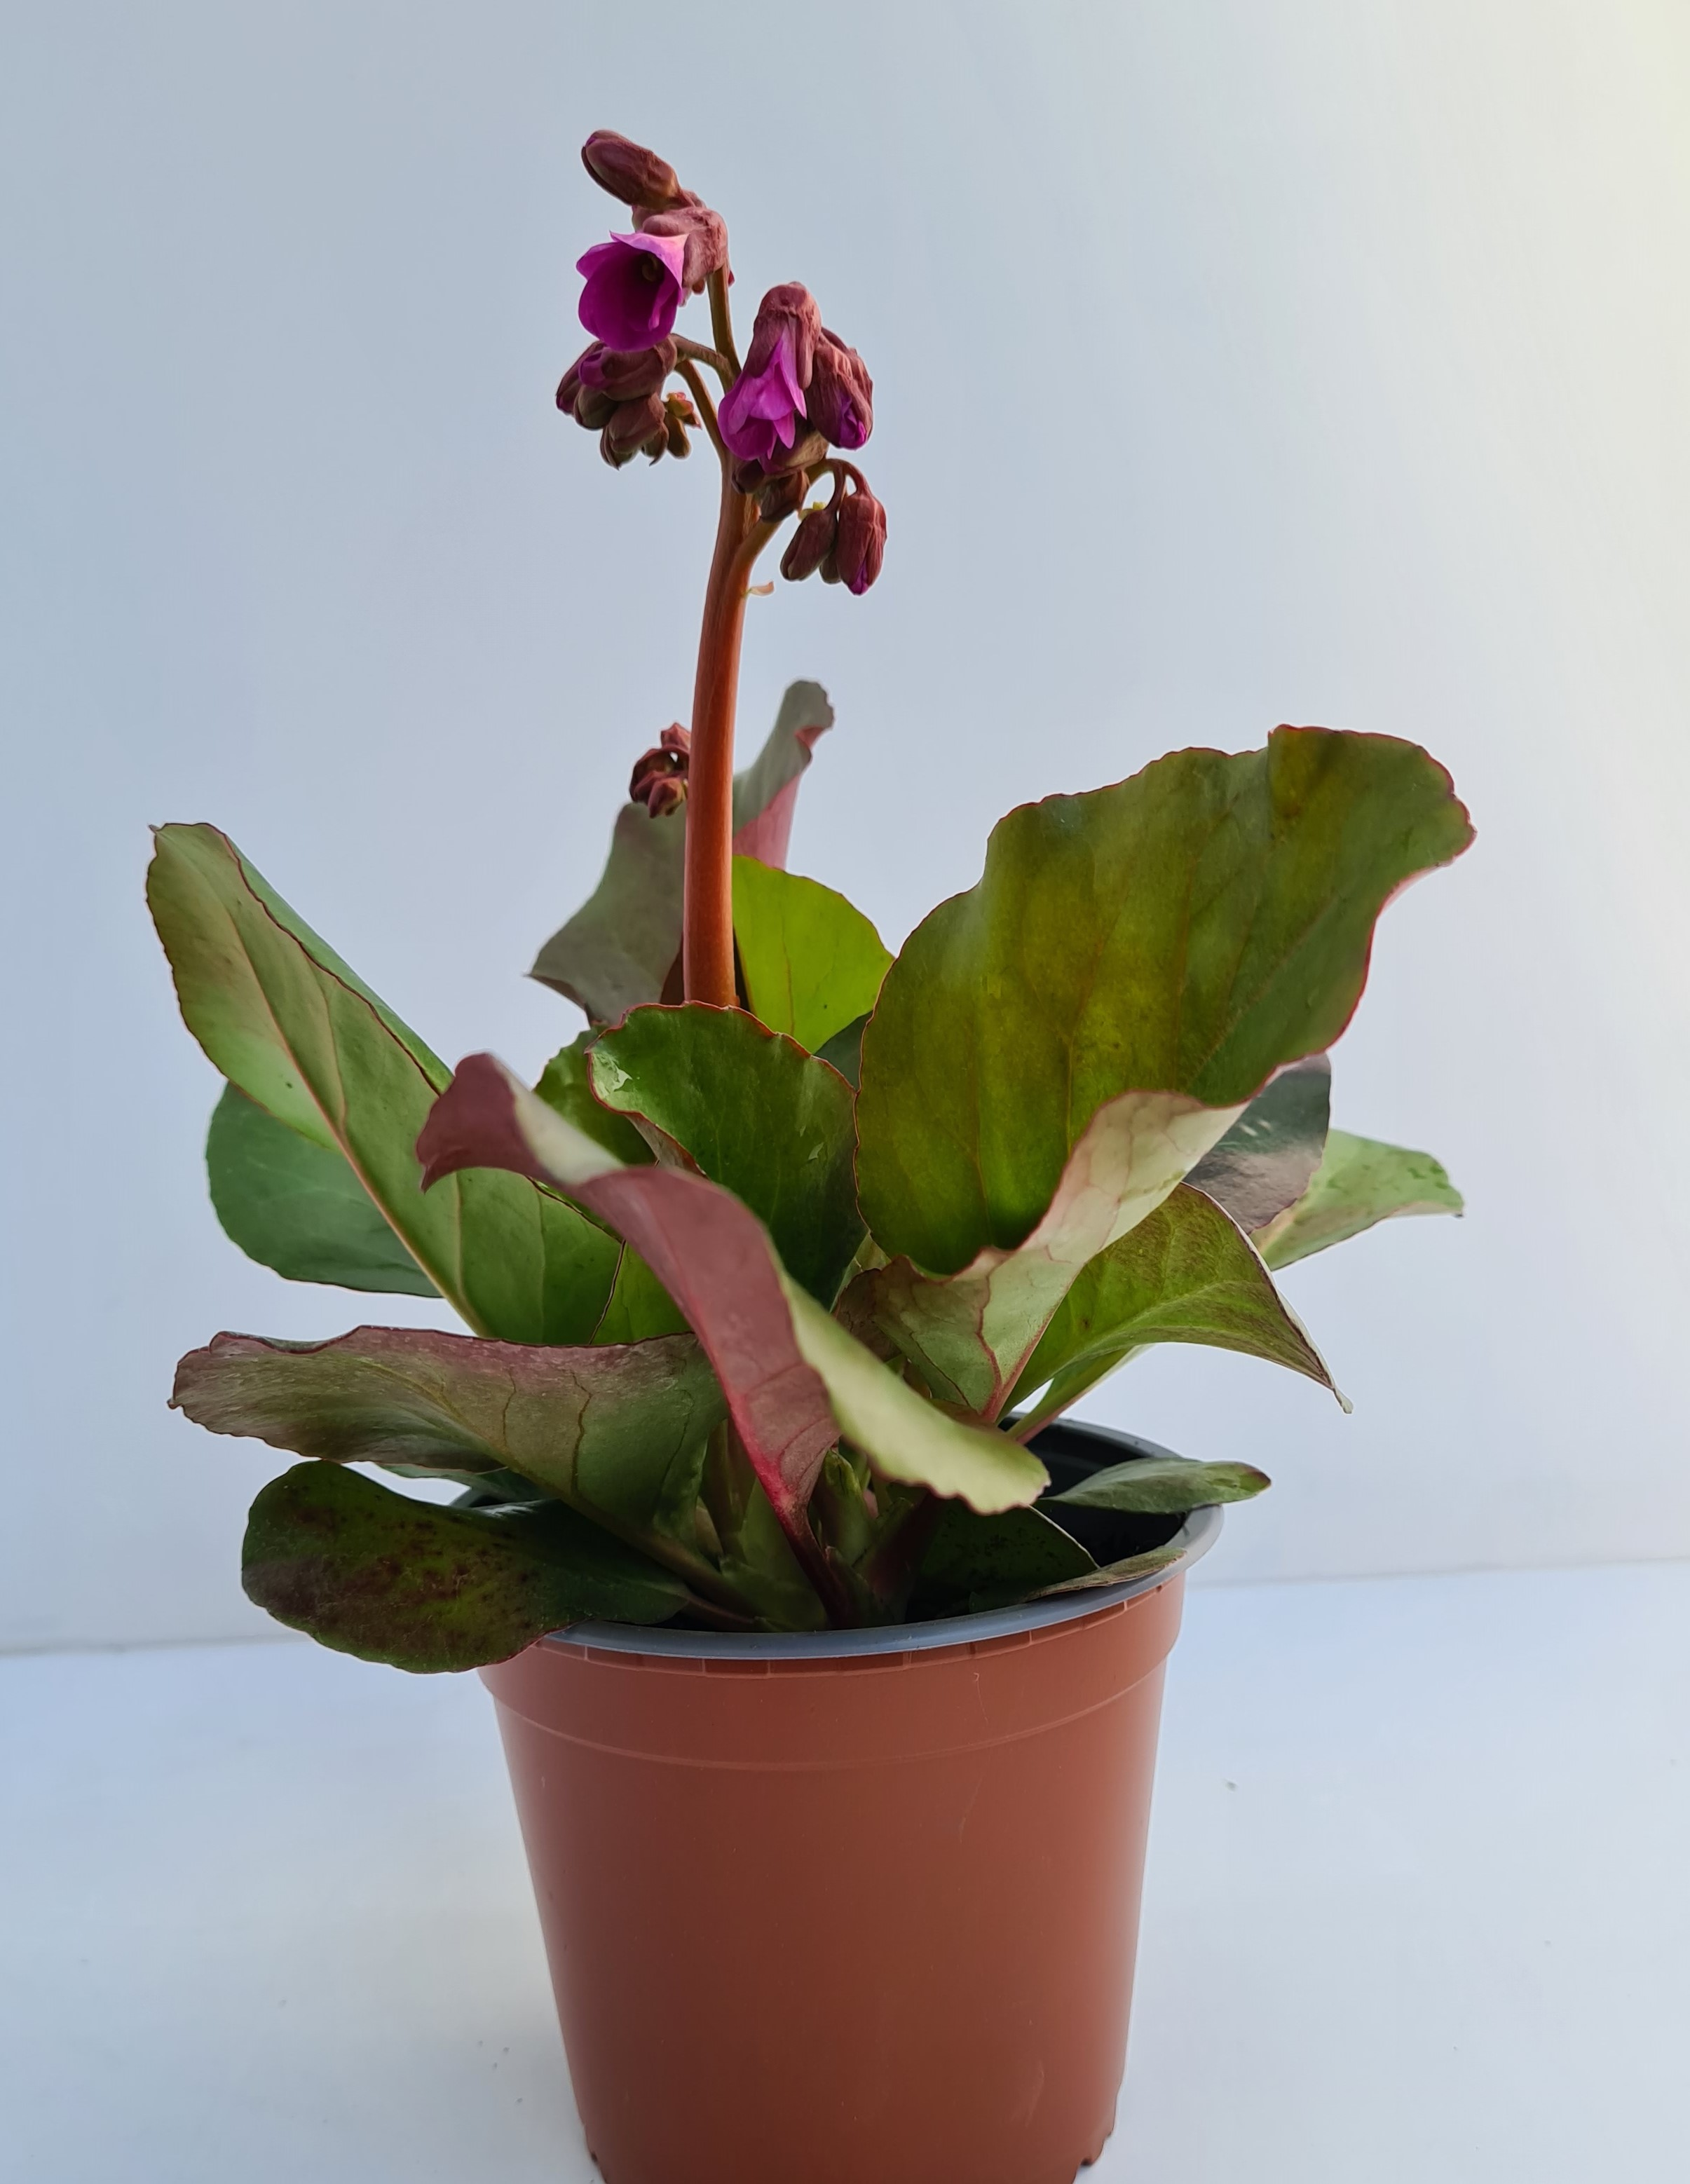 Bergenia cordifolia T12 Shoeshine rosa - sehr winterhart